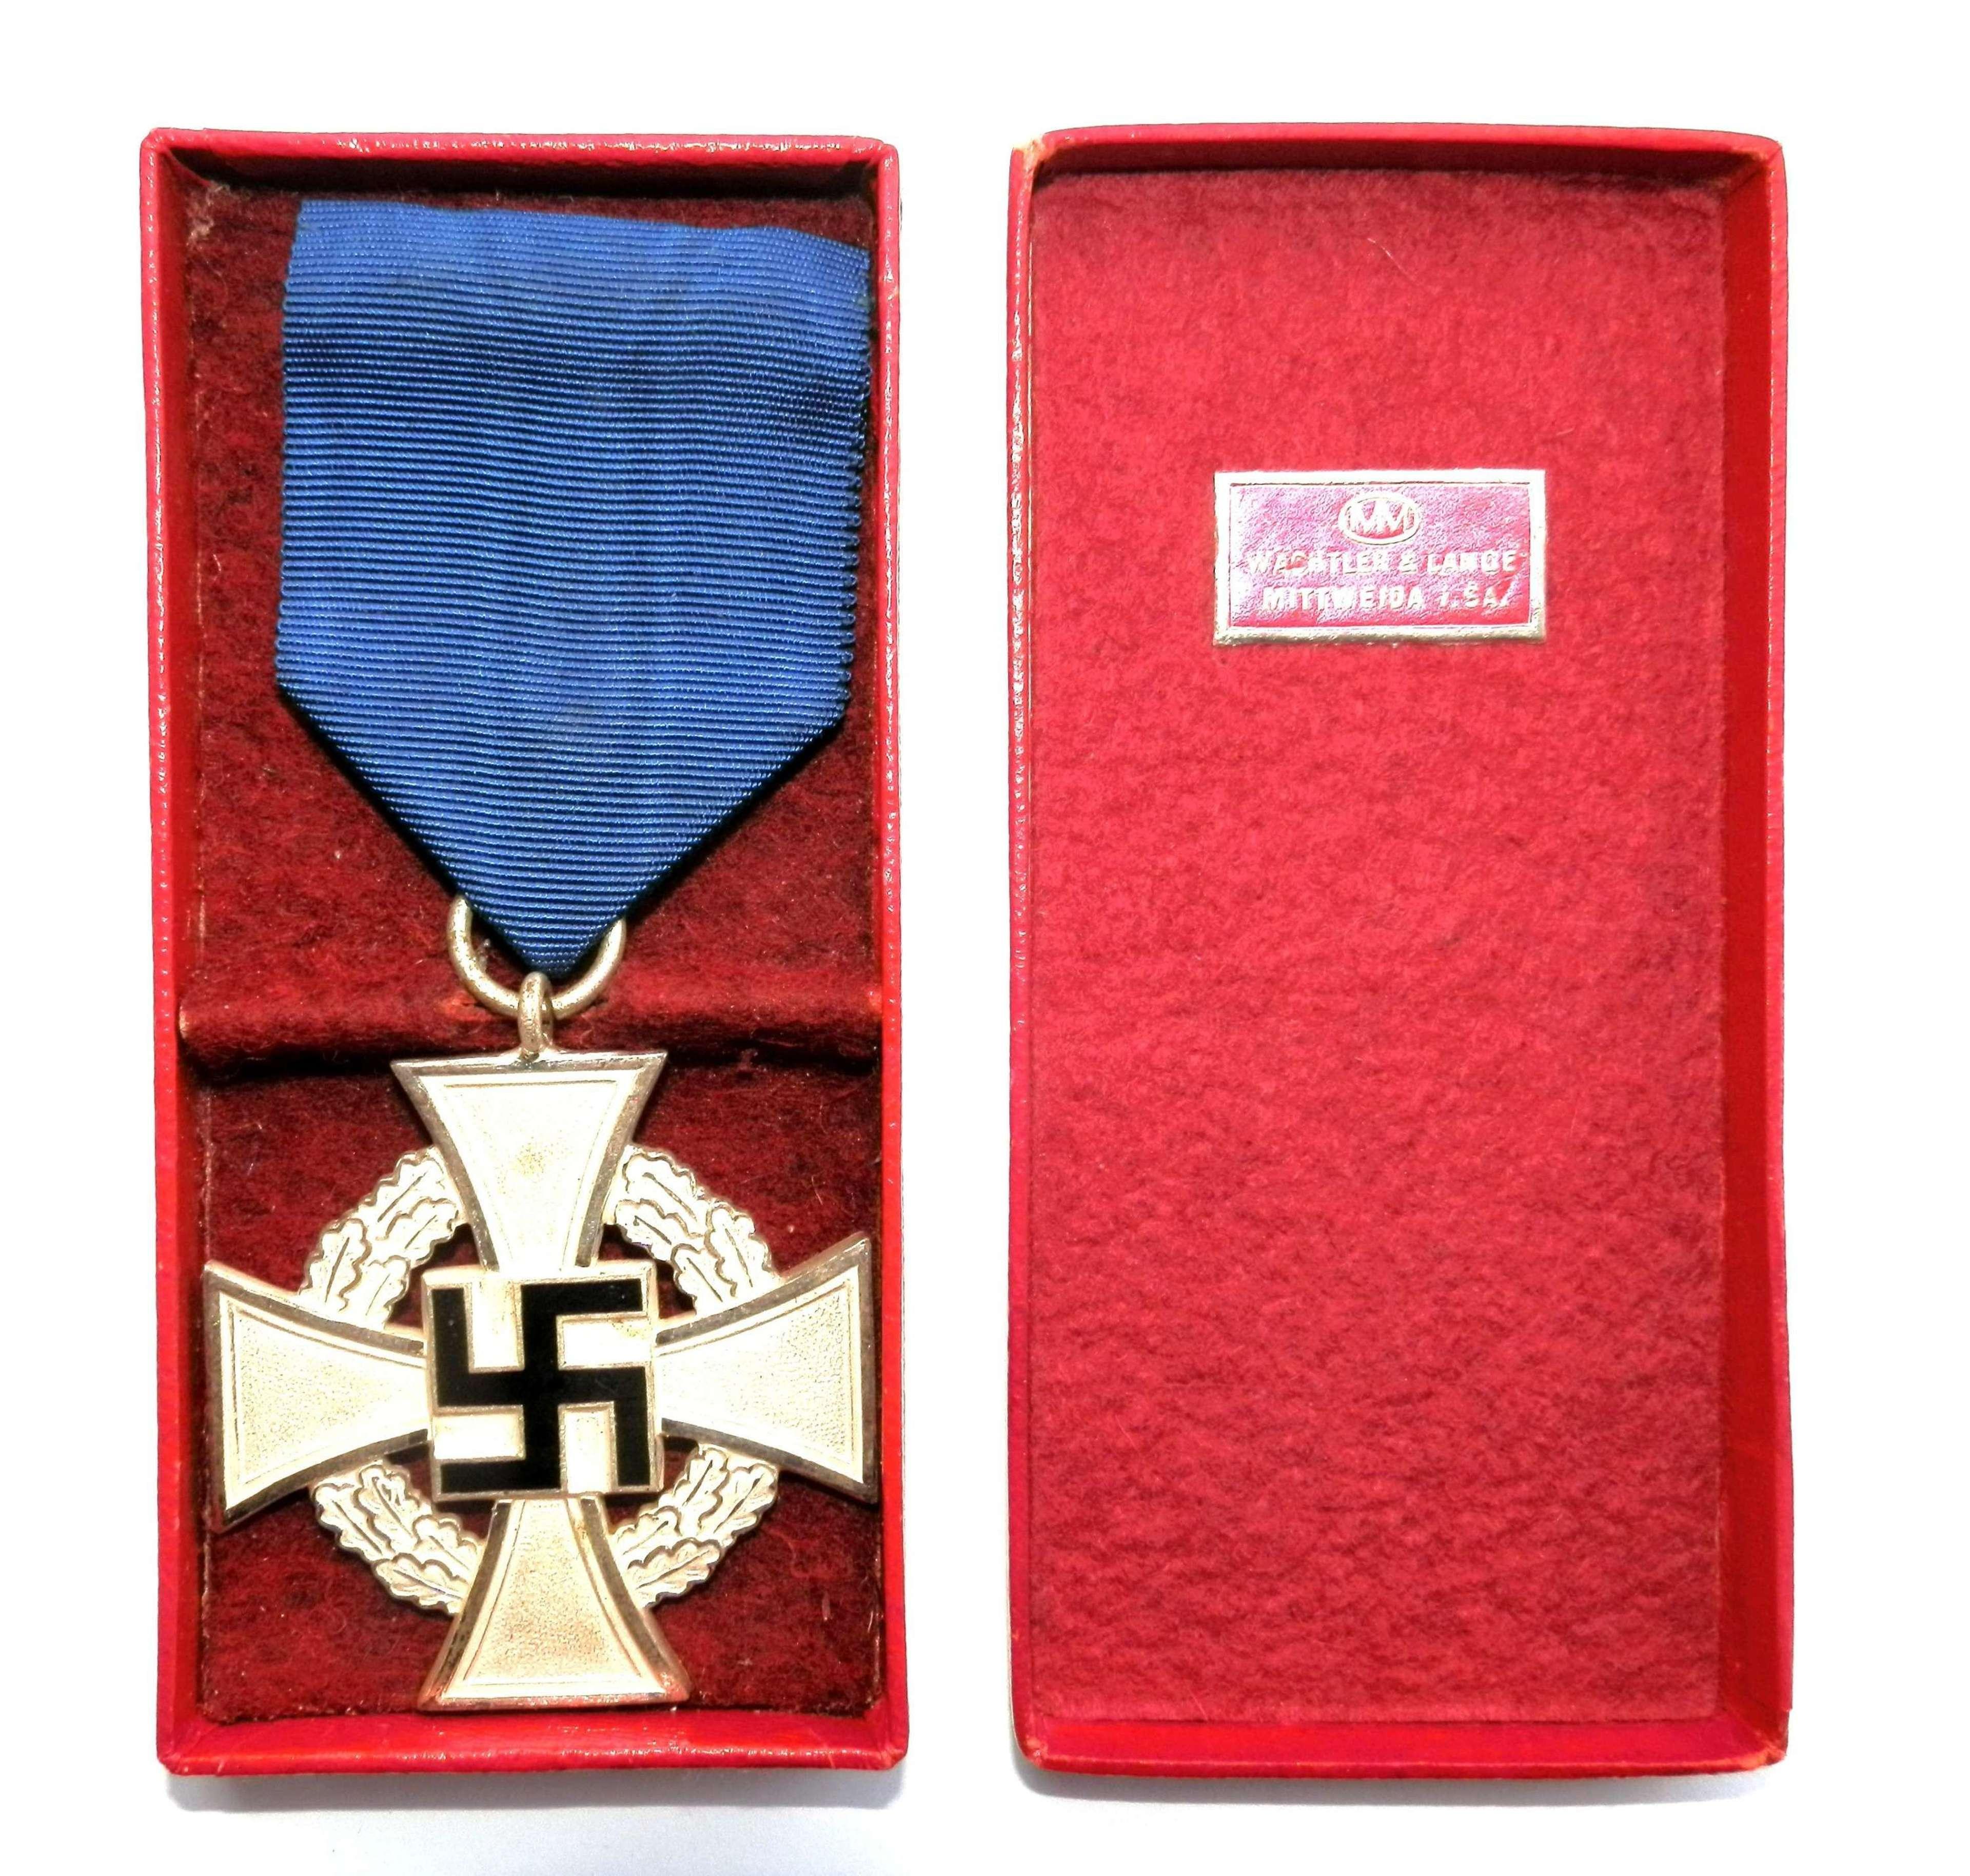 25 Years Faithful Long Service Cross.